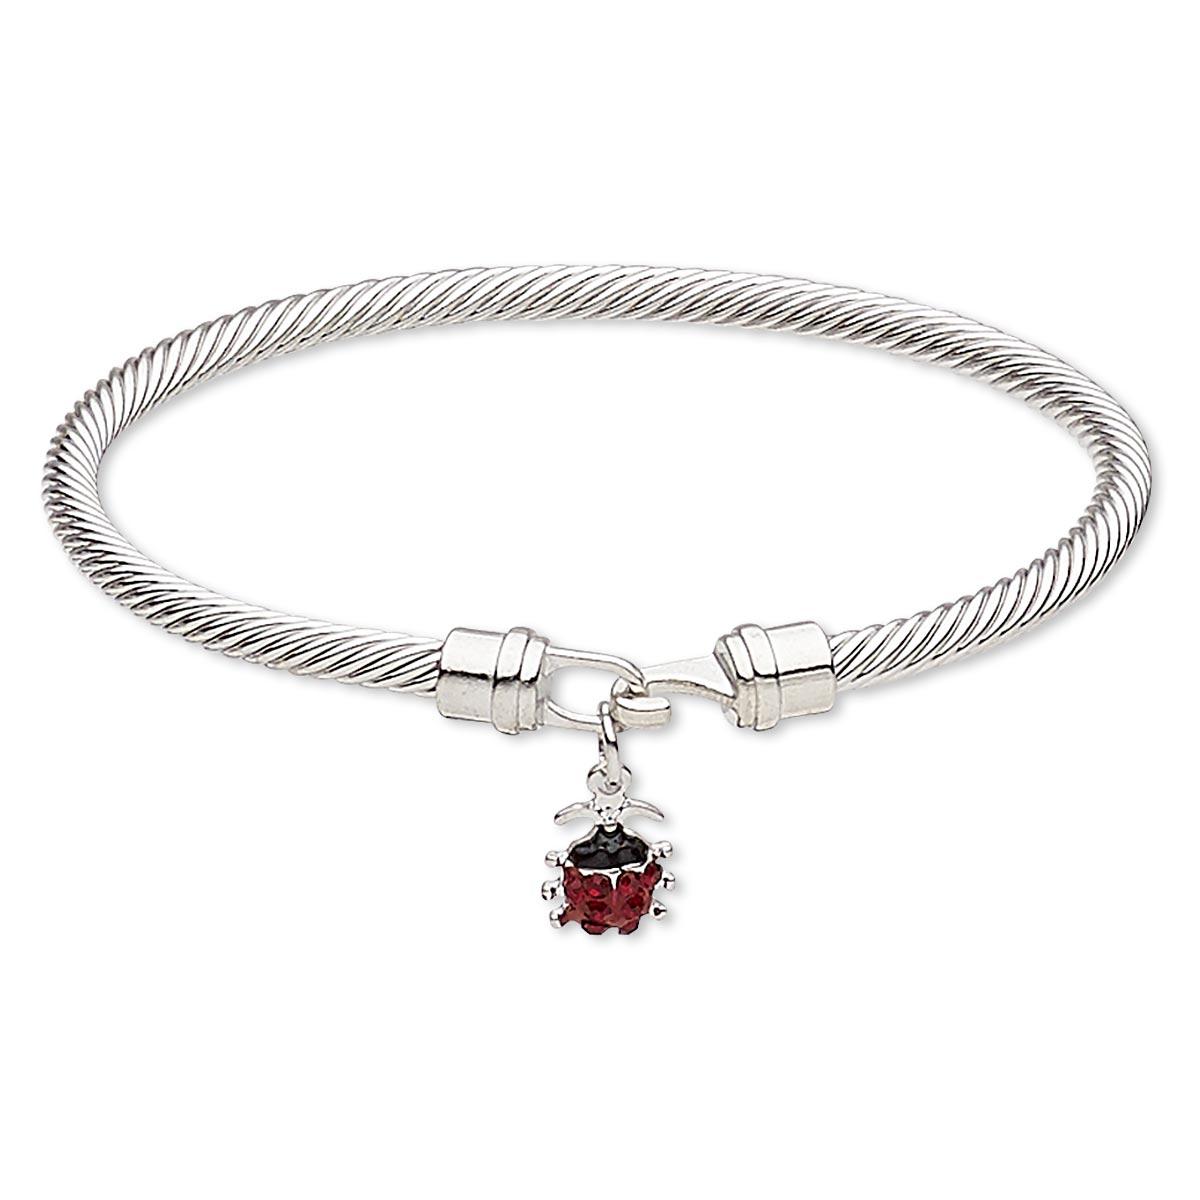 Bracelet Bangle Enamel Czech Glass Rhinestone Silver